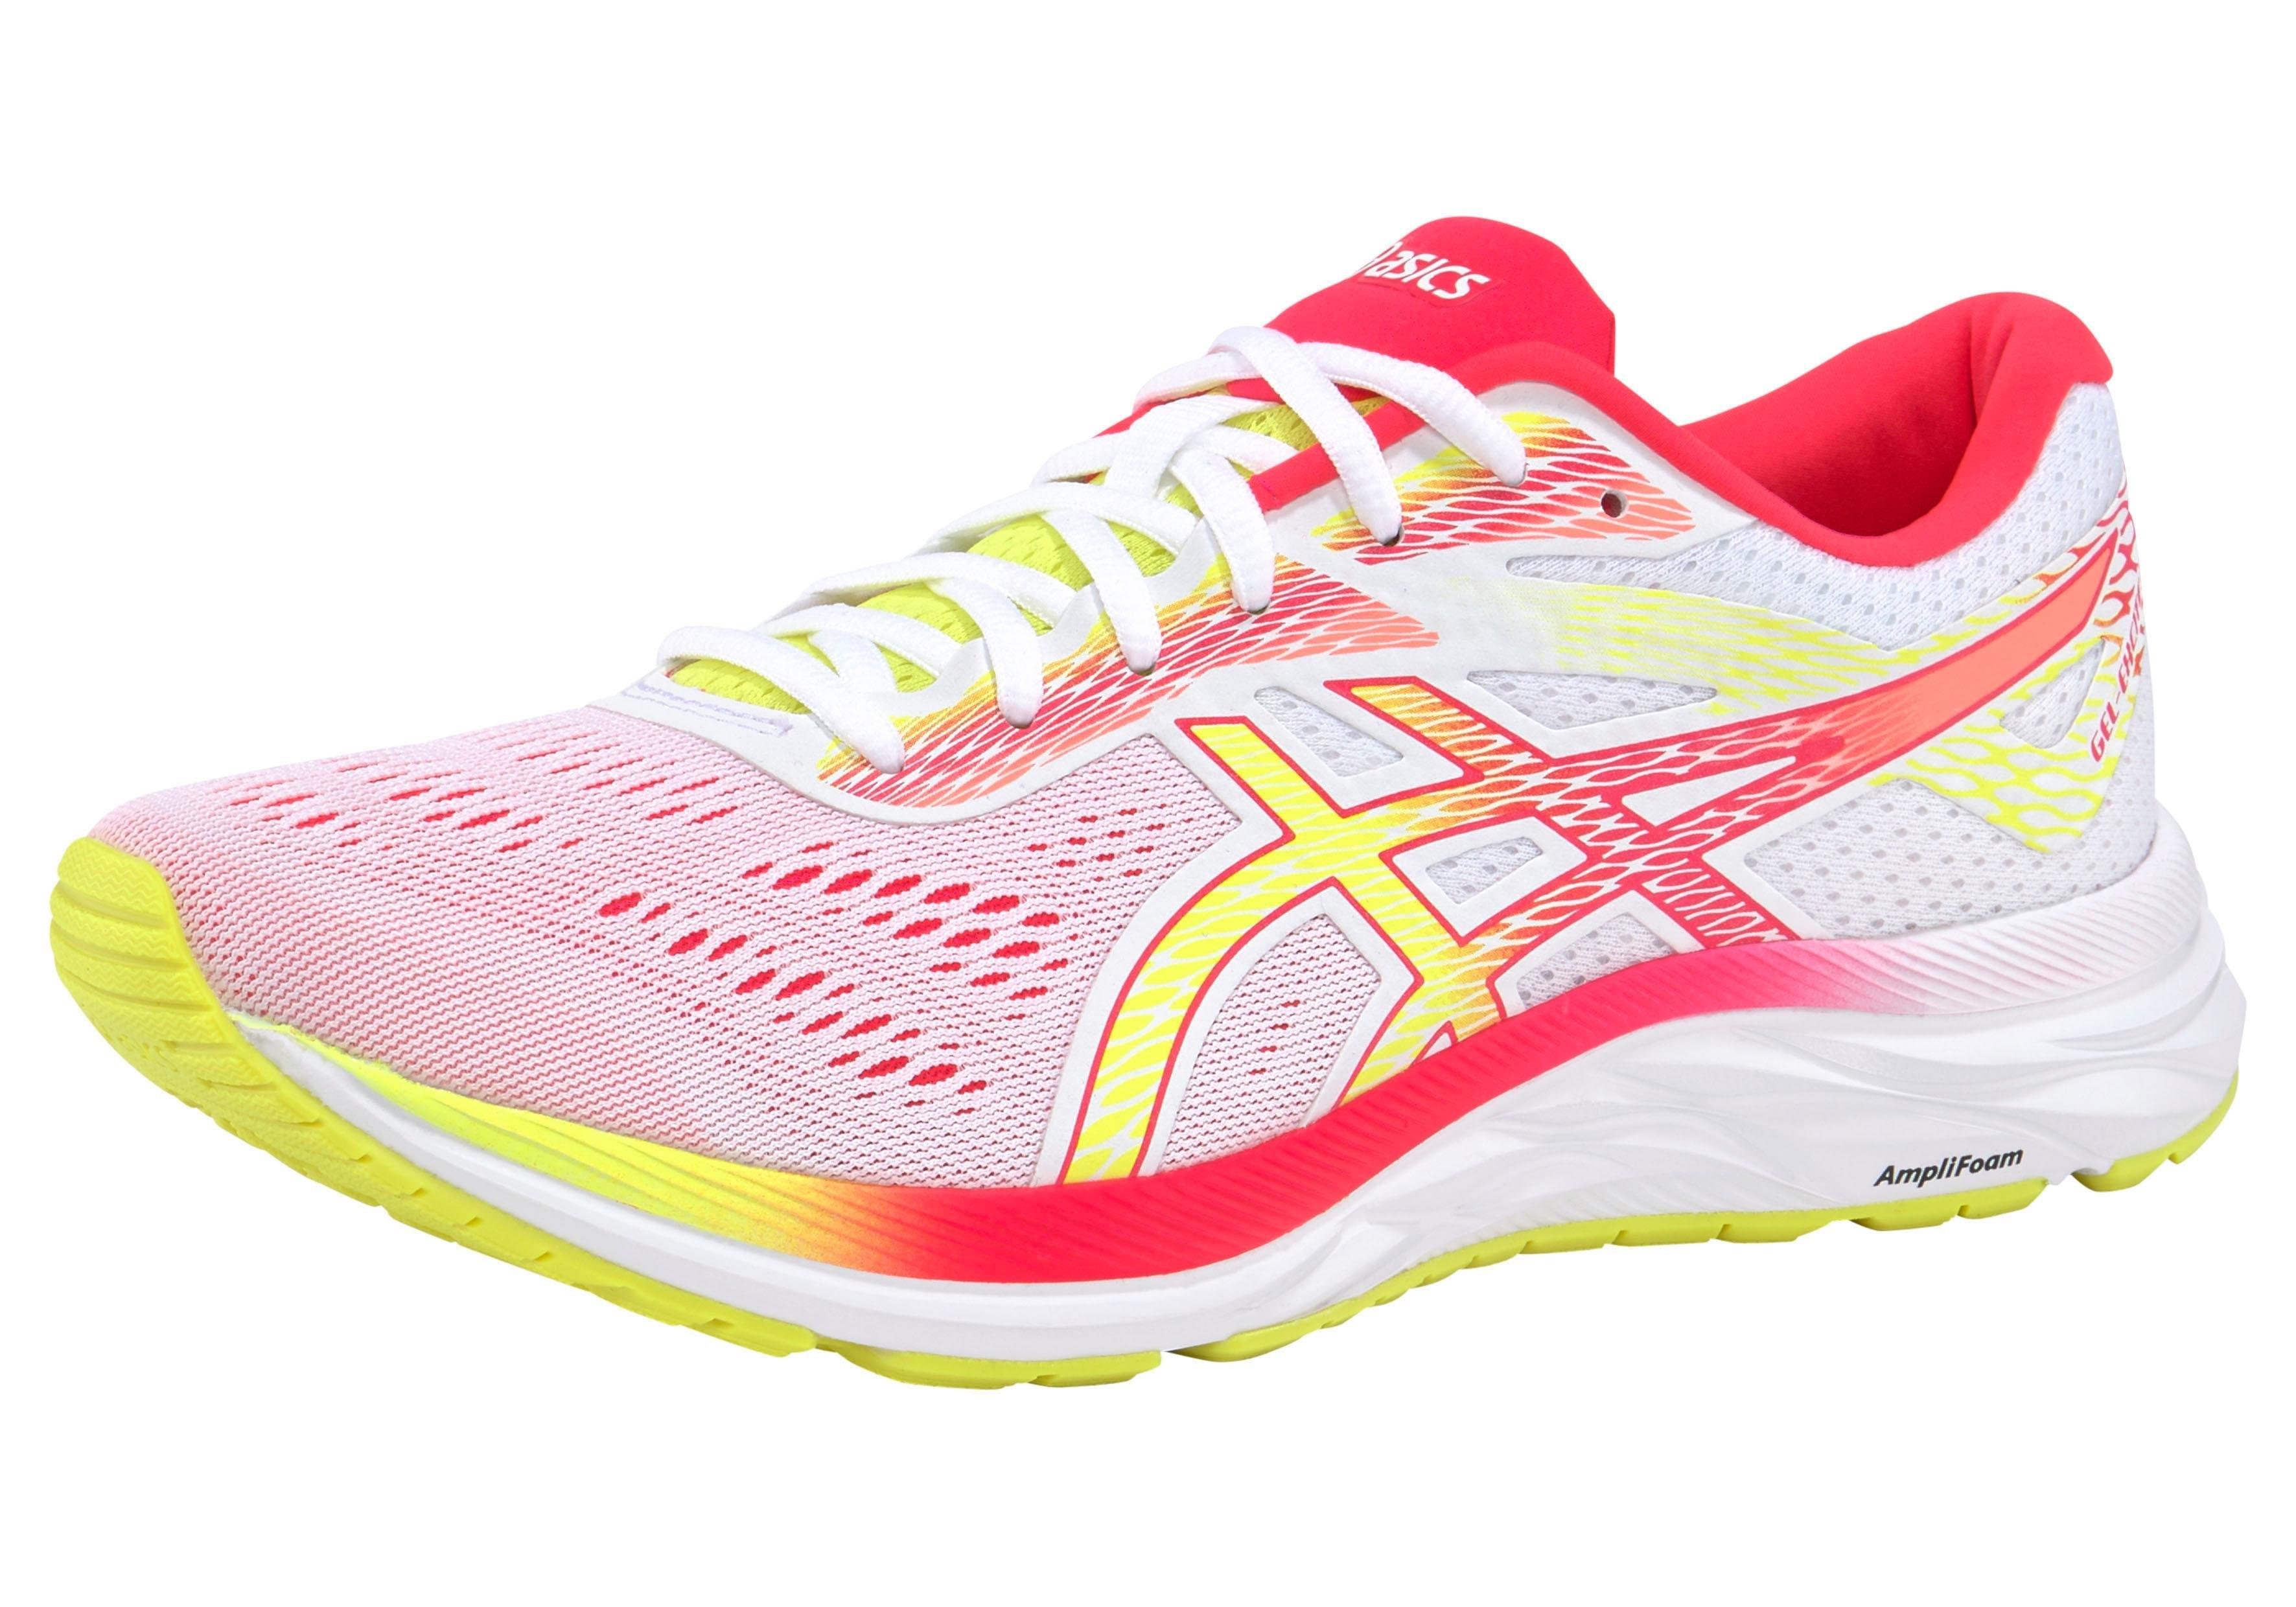 asics runningschoenen »GEL-EXCITE 6« - verschillende betaalmethodes